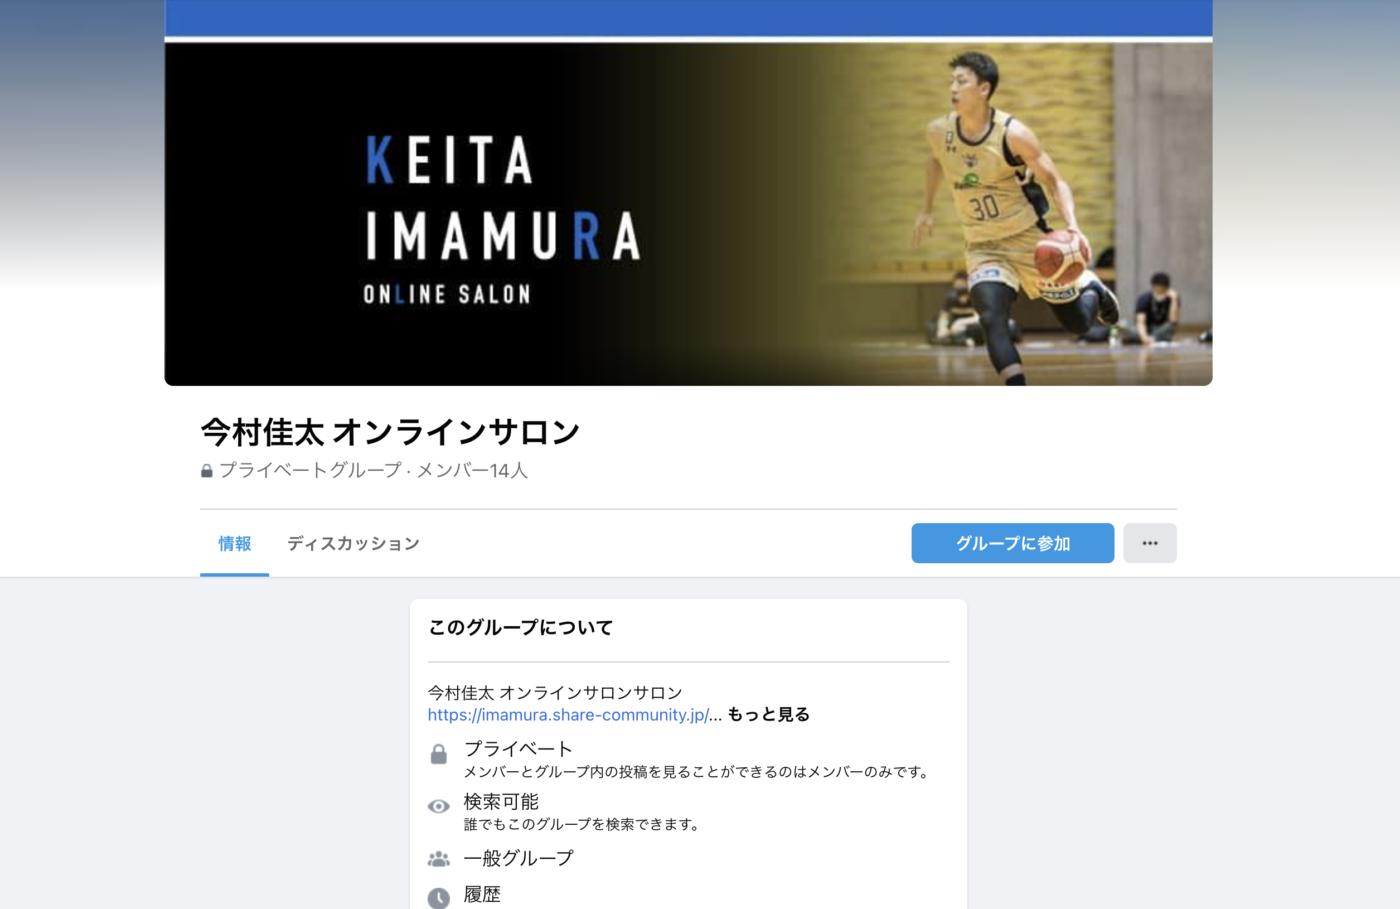 「KEITA IMAMURA ONLINE SALON」Facebookページ